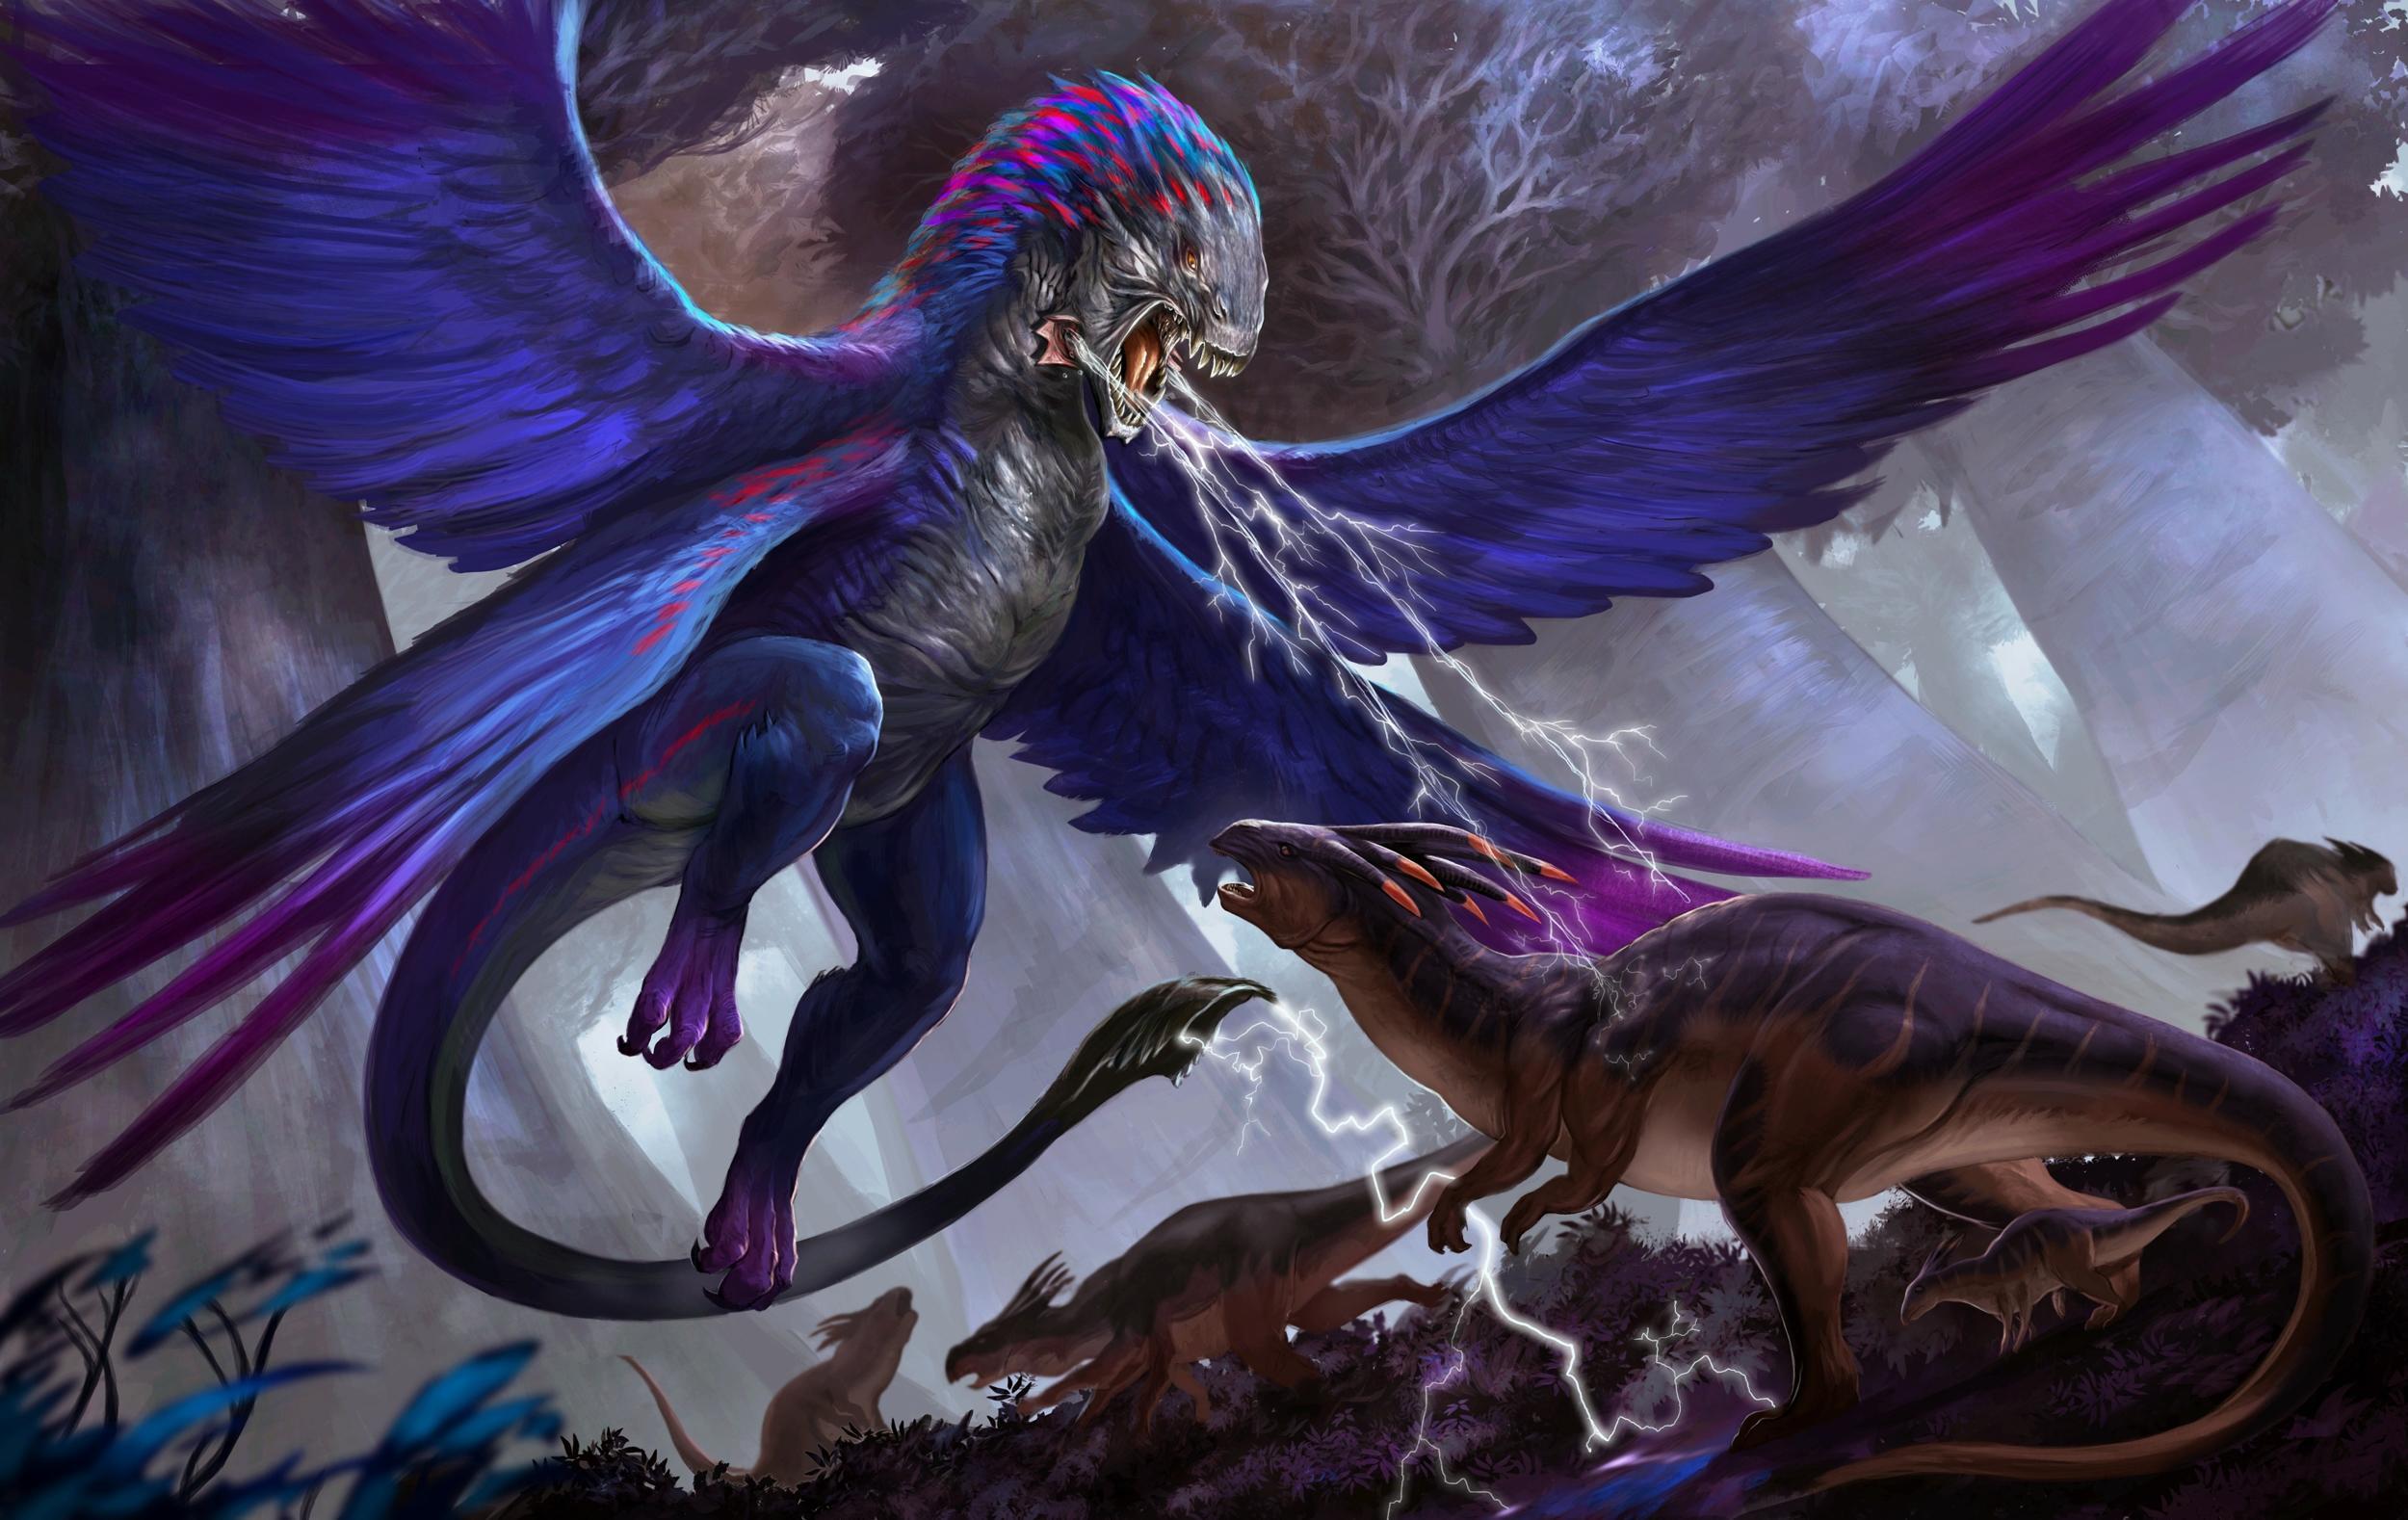 Обои Фульгур и гексакорн, драконы, монстры, фанастика